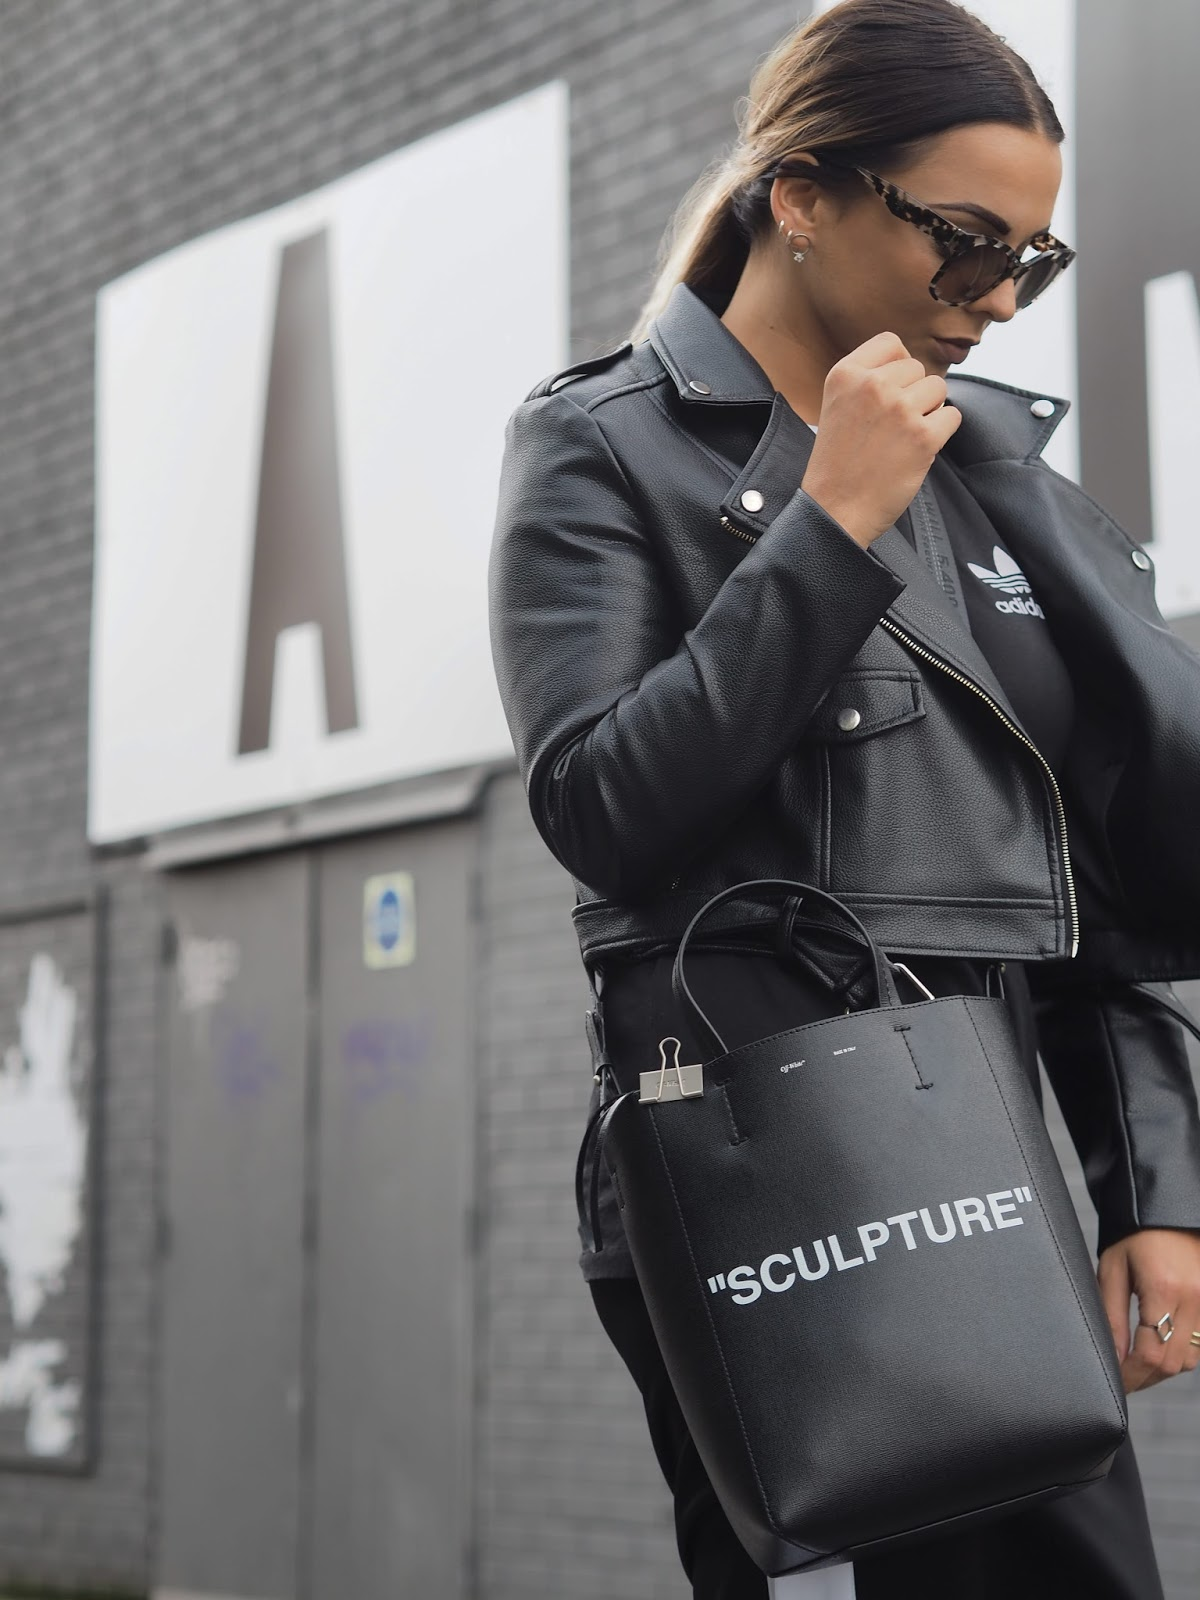 that off white sculpture bag uk women 39 s fashion fitness. Black Bedroom Furniture Sets. Home Design Ideas